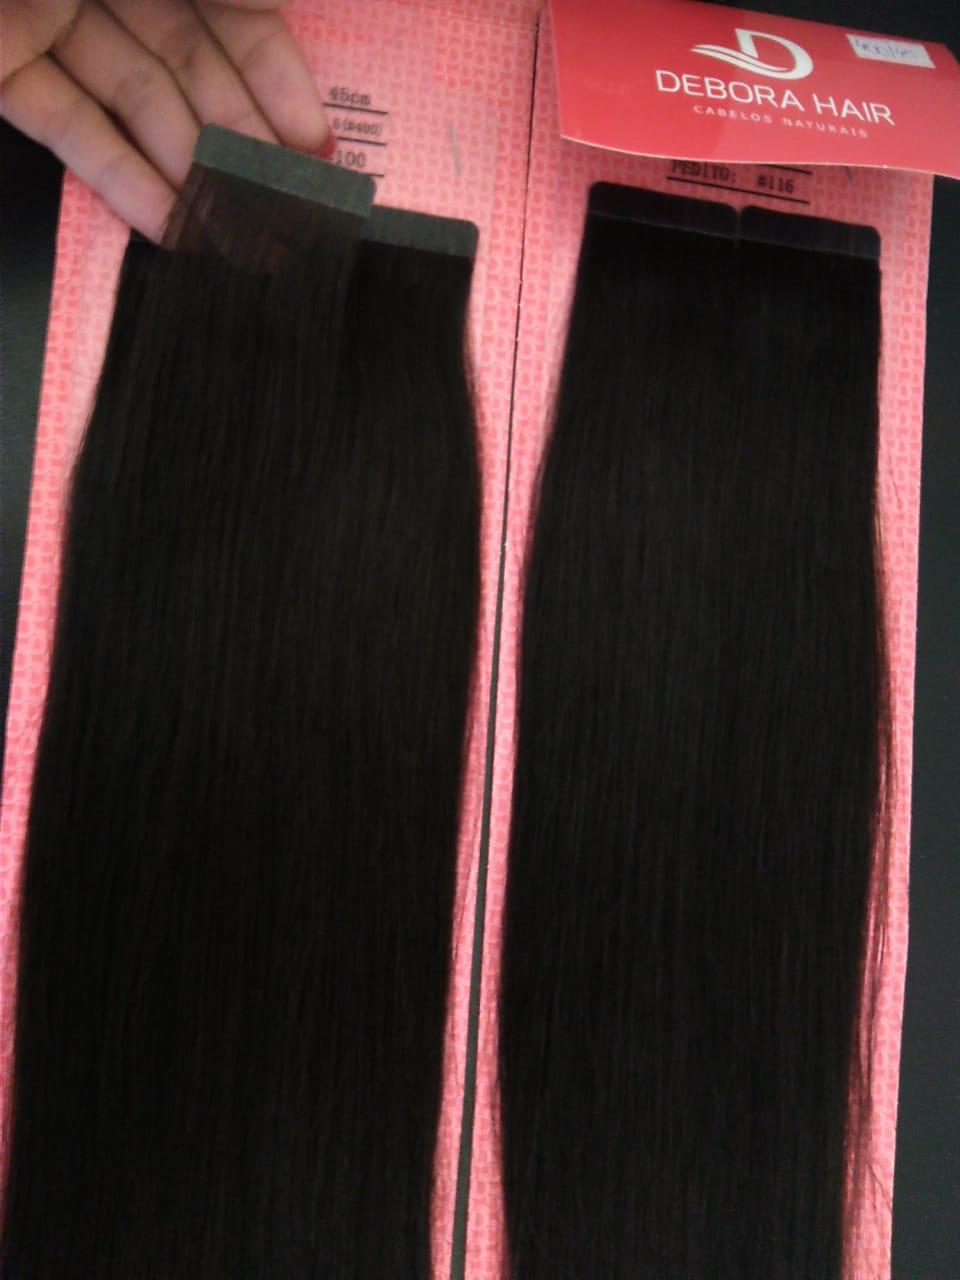 MEGA HAIR ADESIVADO 400  - DEBORA HAIR